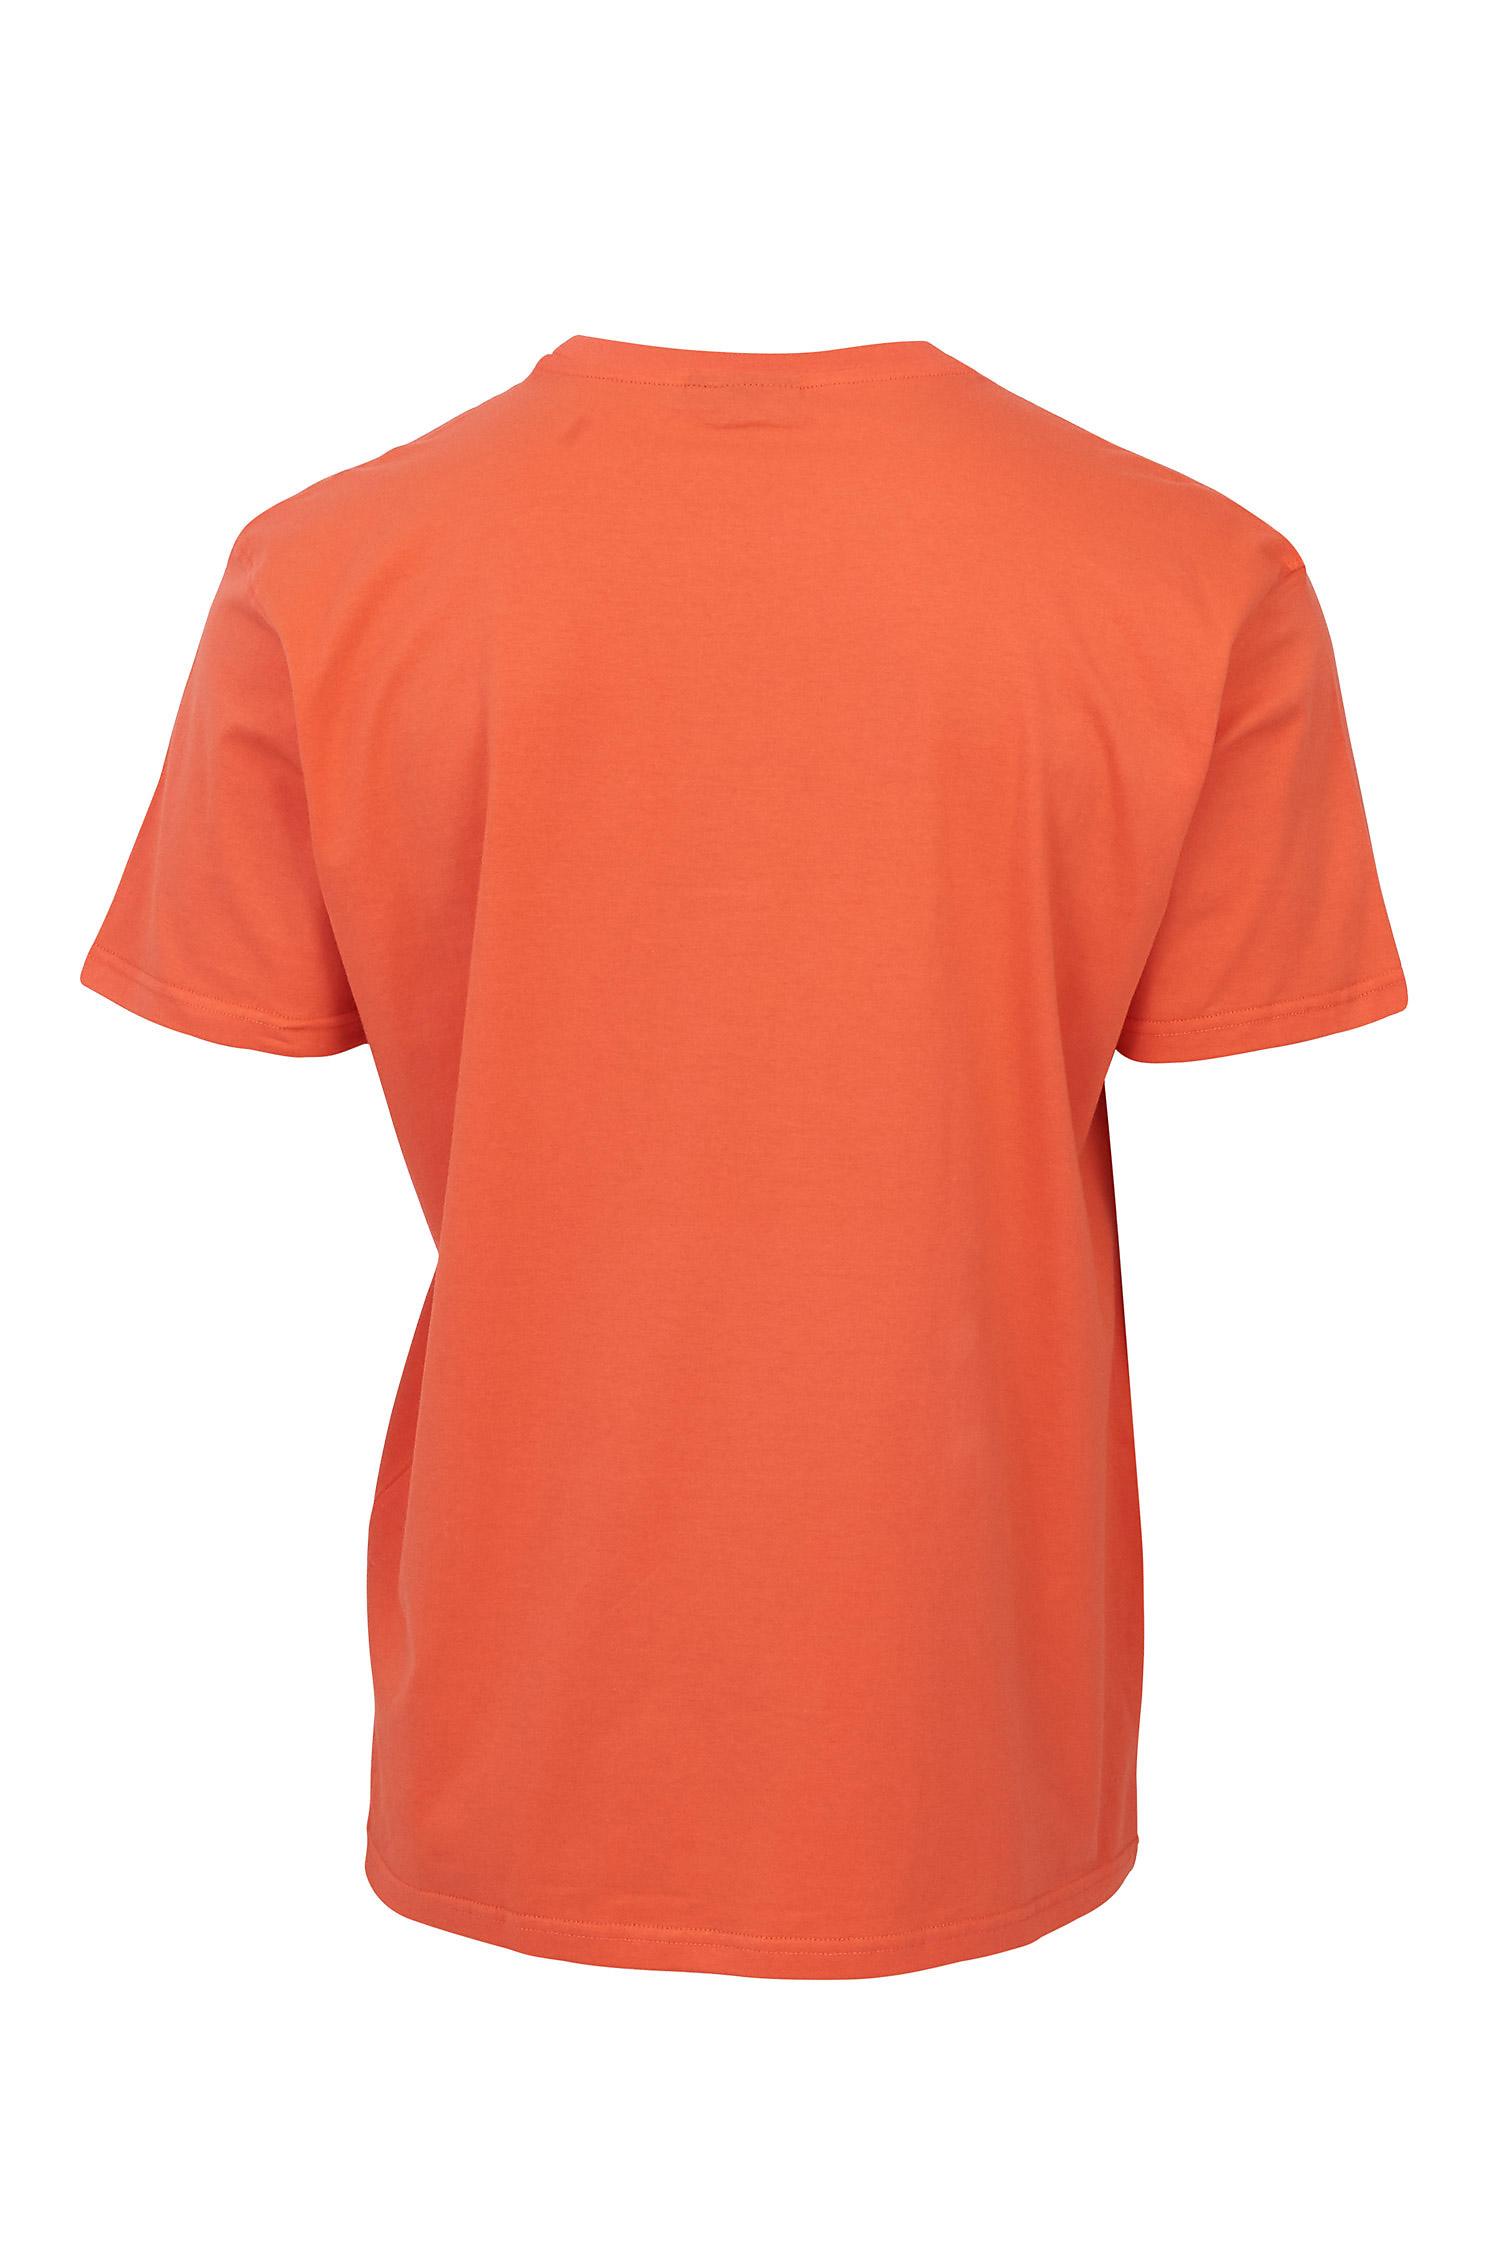 Sport, Camisetas M. Corta, 107495, NARANJA | Zoom